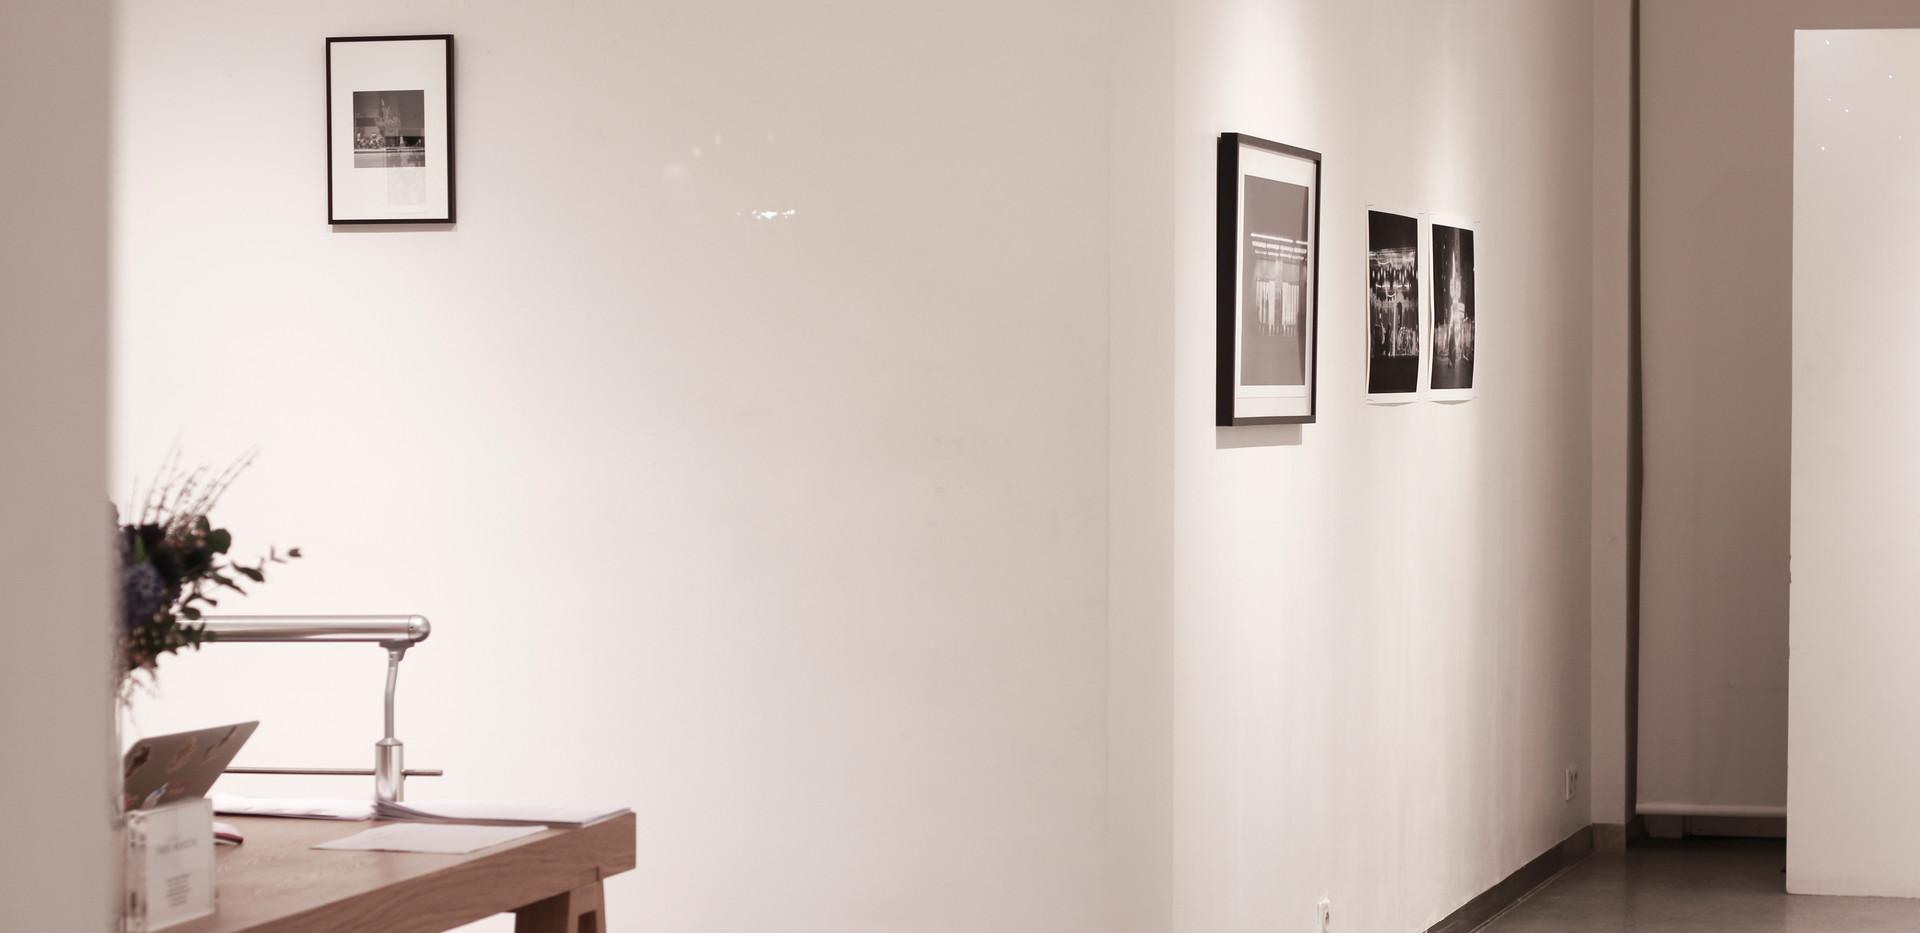 jinyong lian-galerie paris horizon-05.jp